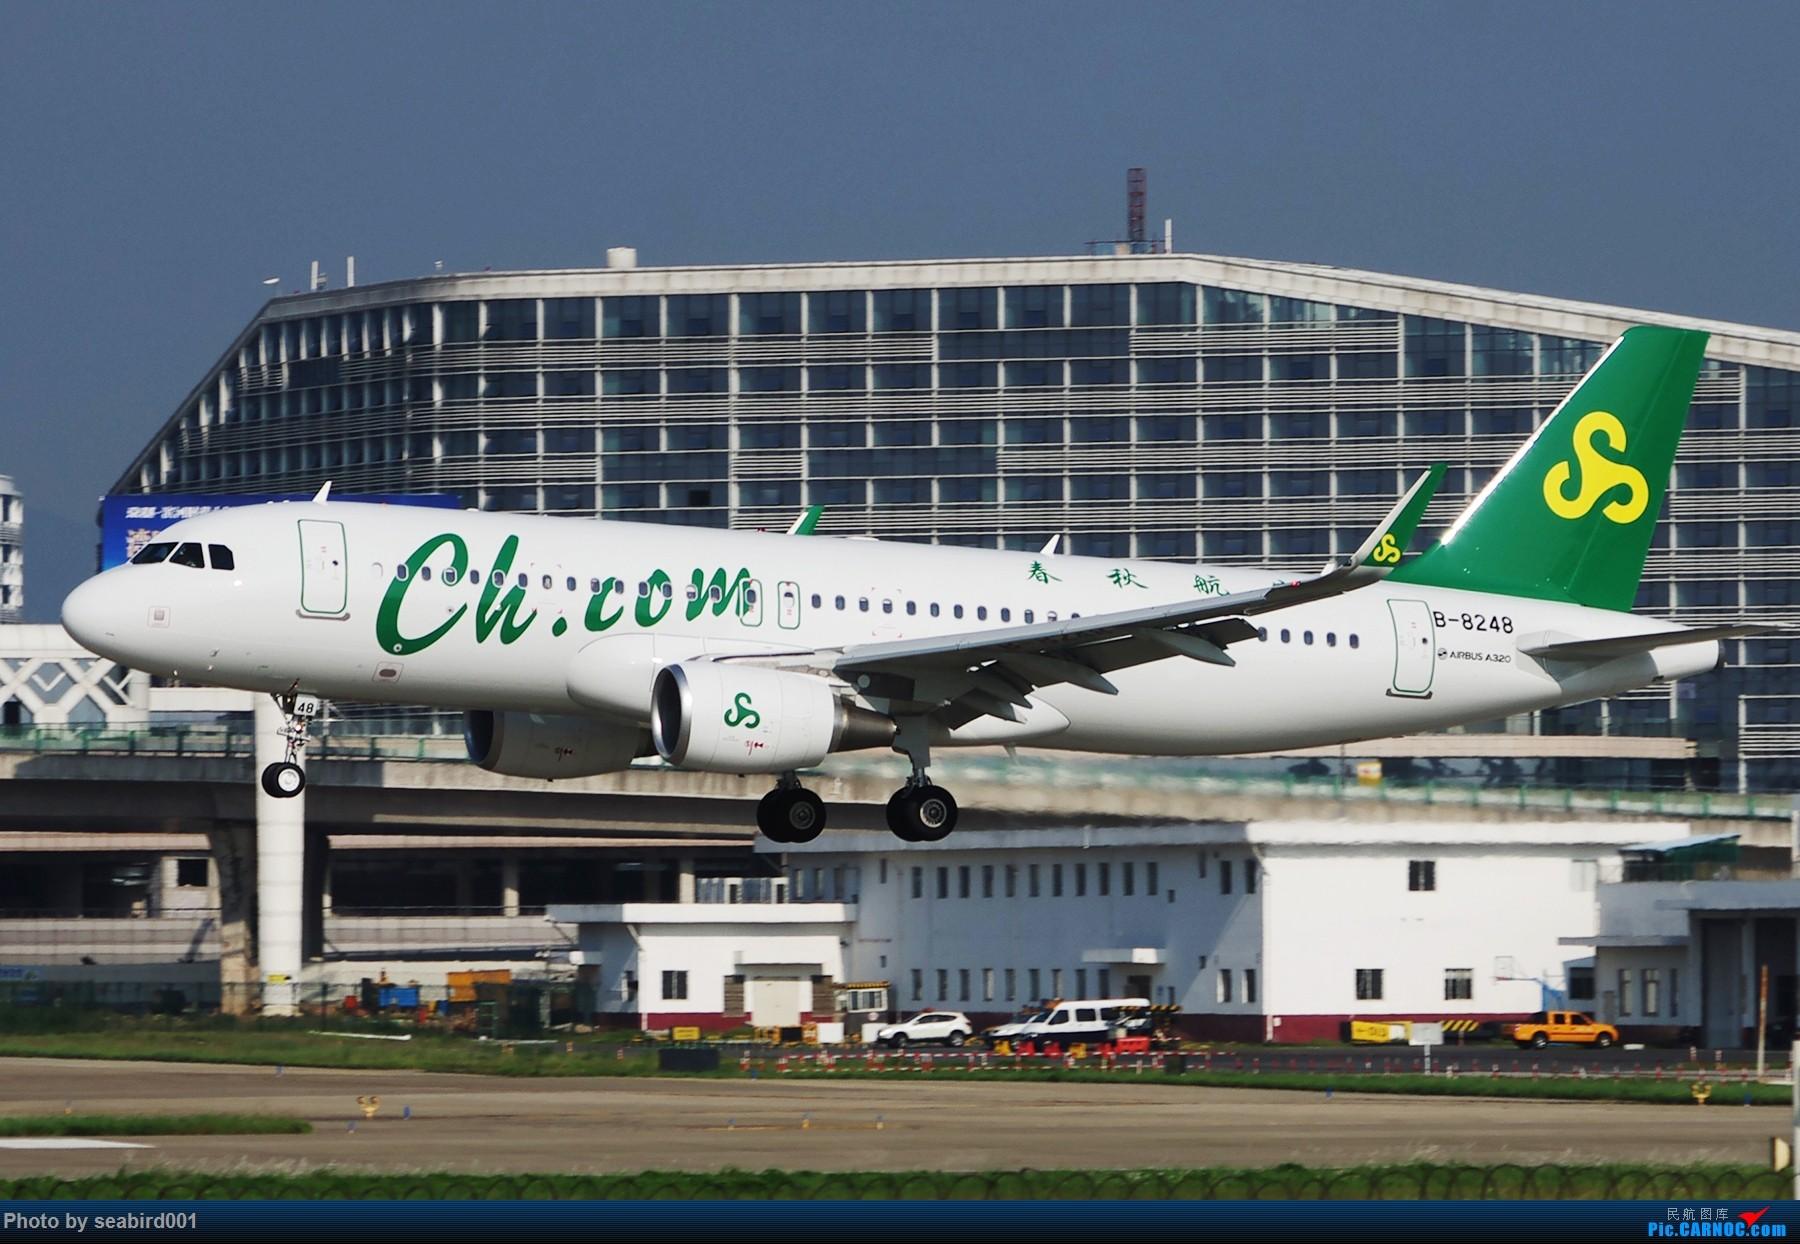 Re:[原创]飞机组图。 AIRBUS A320-200 B-8248 中国深圳宝安国际机场